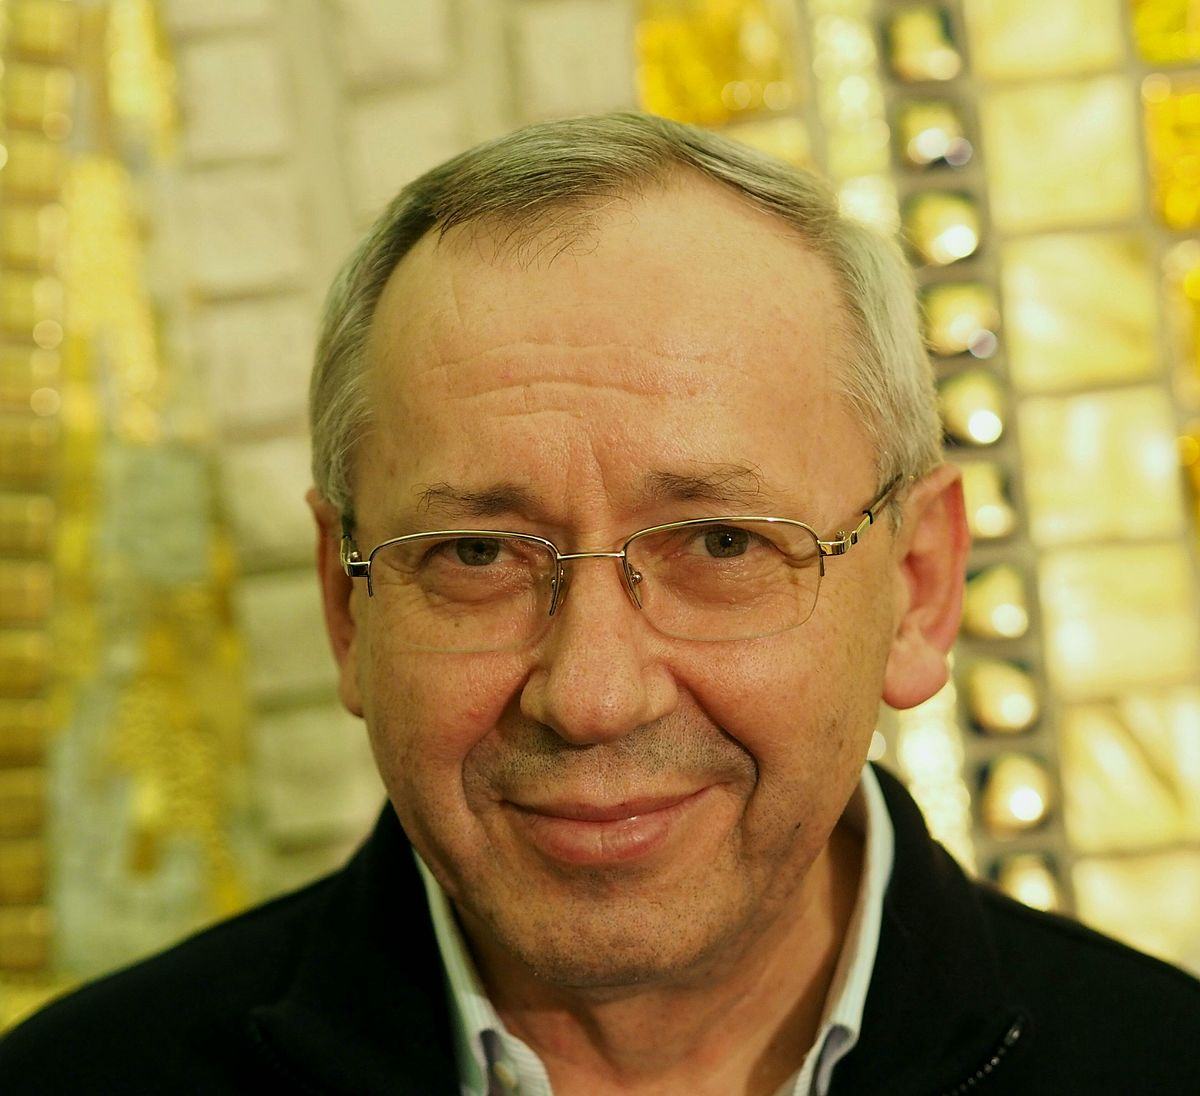 Padre Marko Rupnik